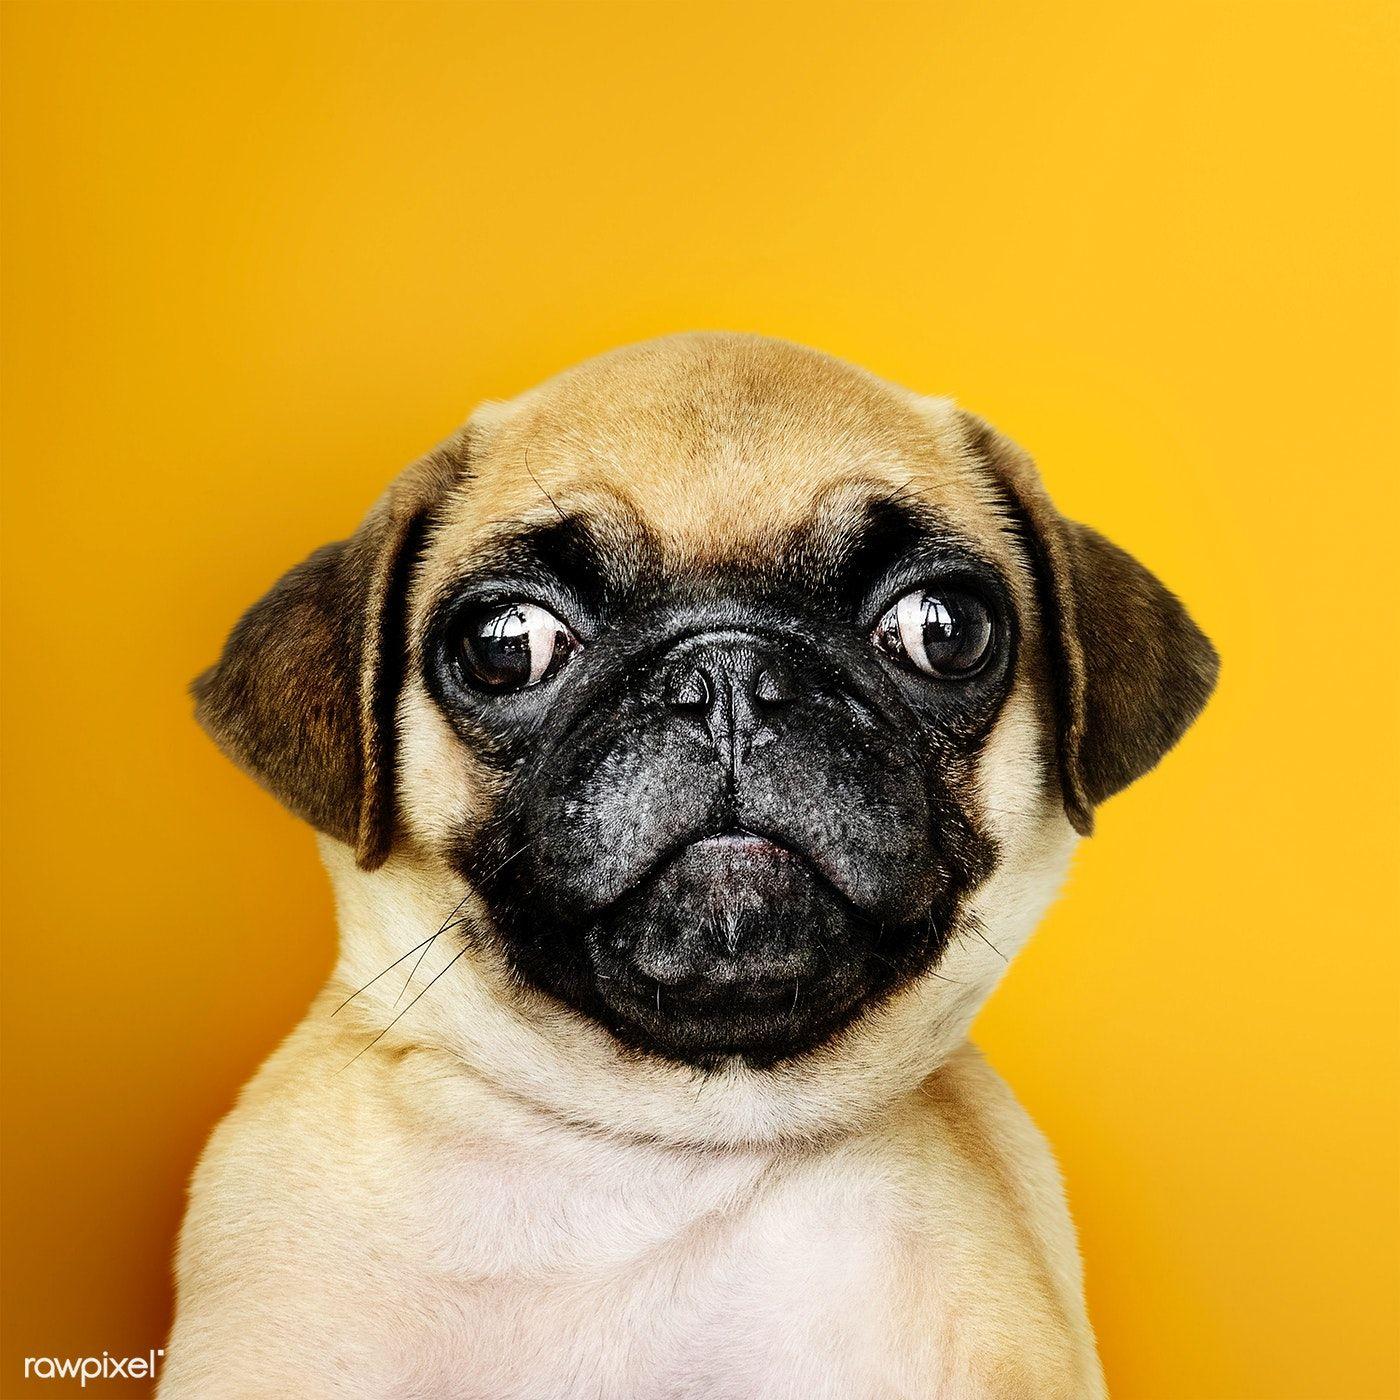 Download Premium Photo Of Adorable Pug Puppy Solo Portrait 542341